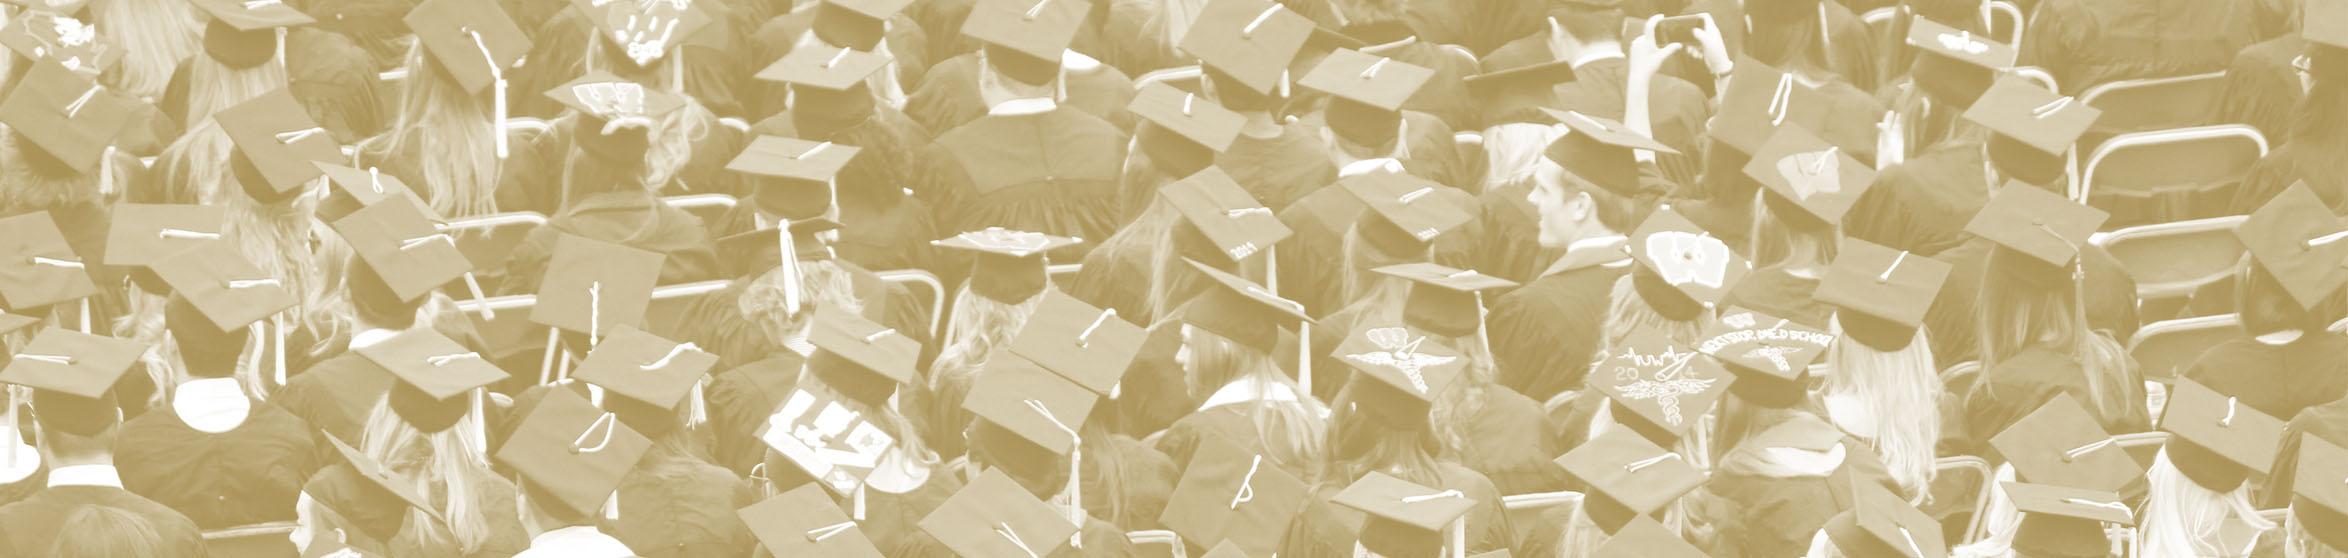 Graduation Retention